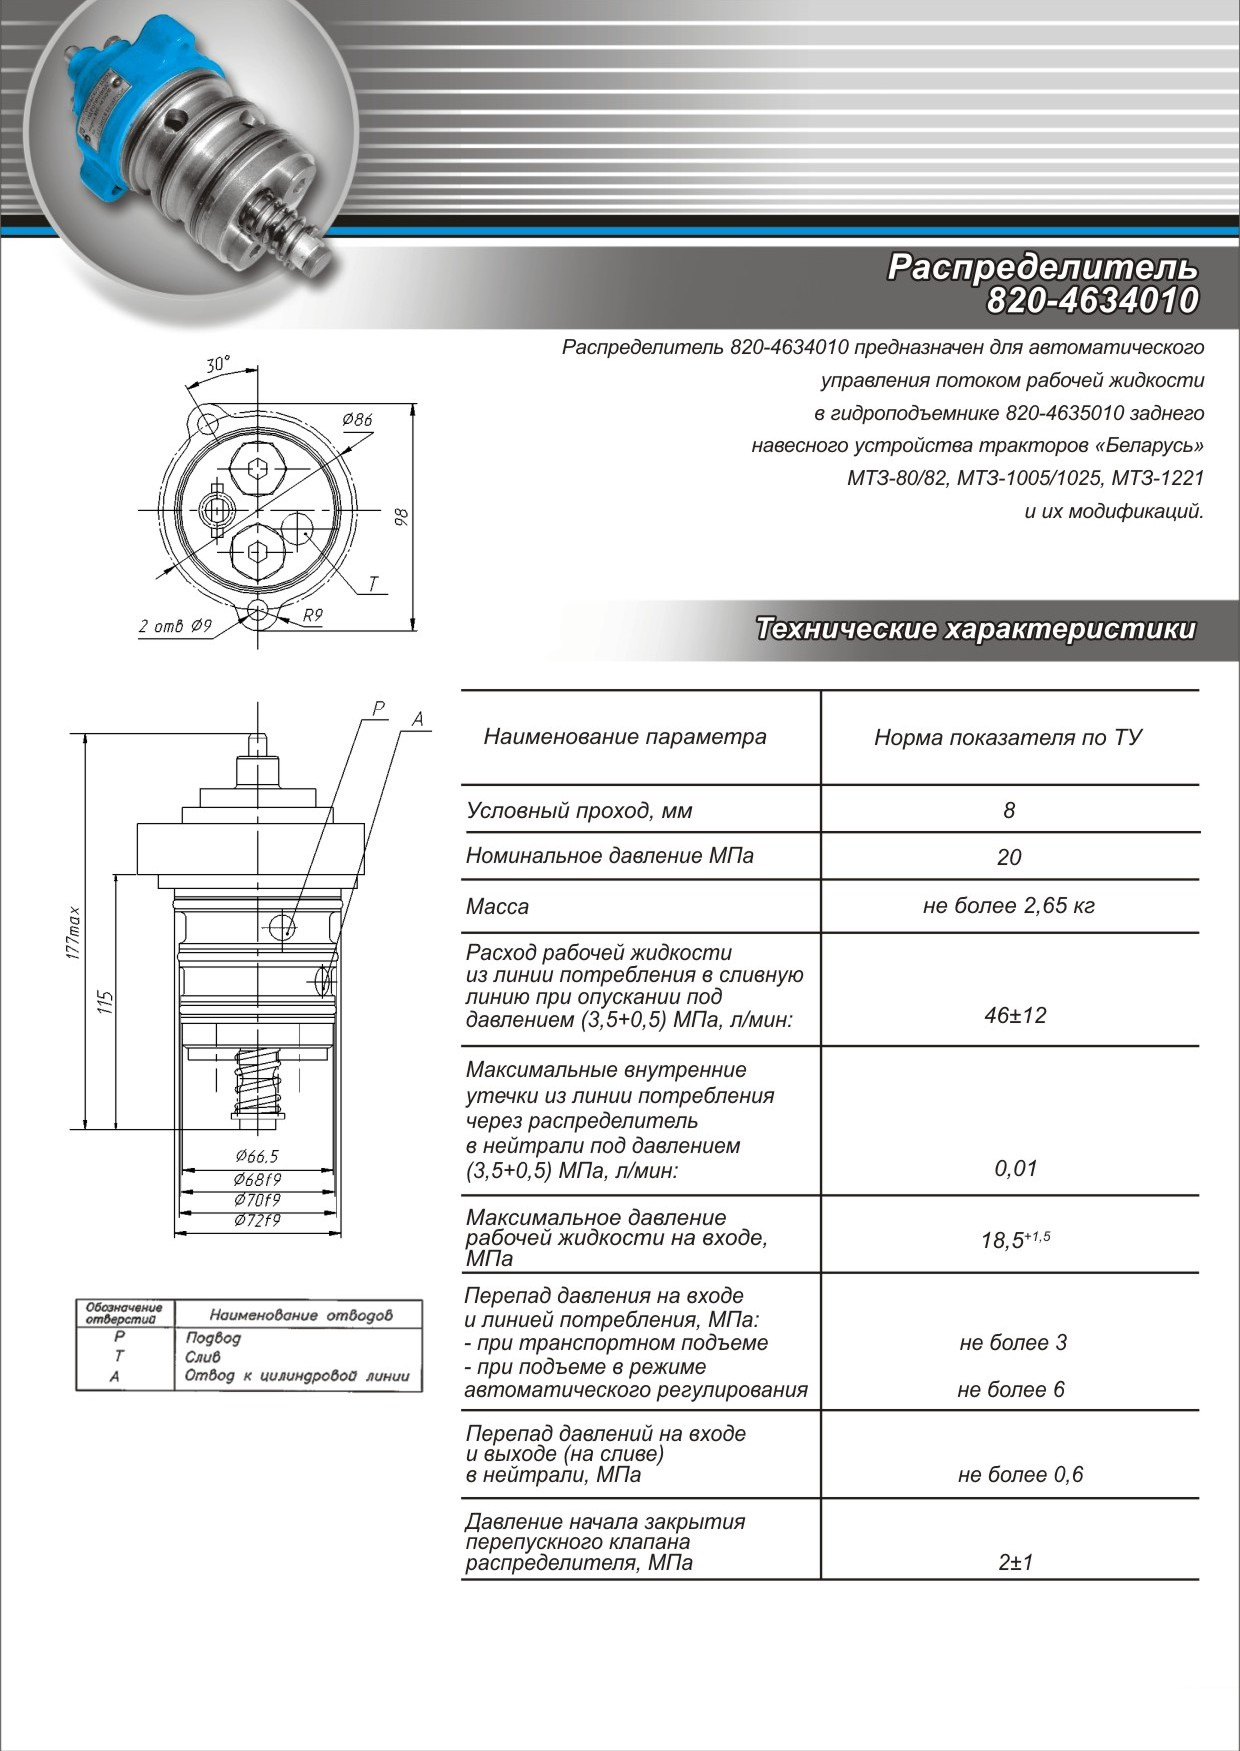 Raspredelitel-820-4634010